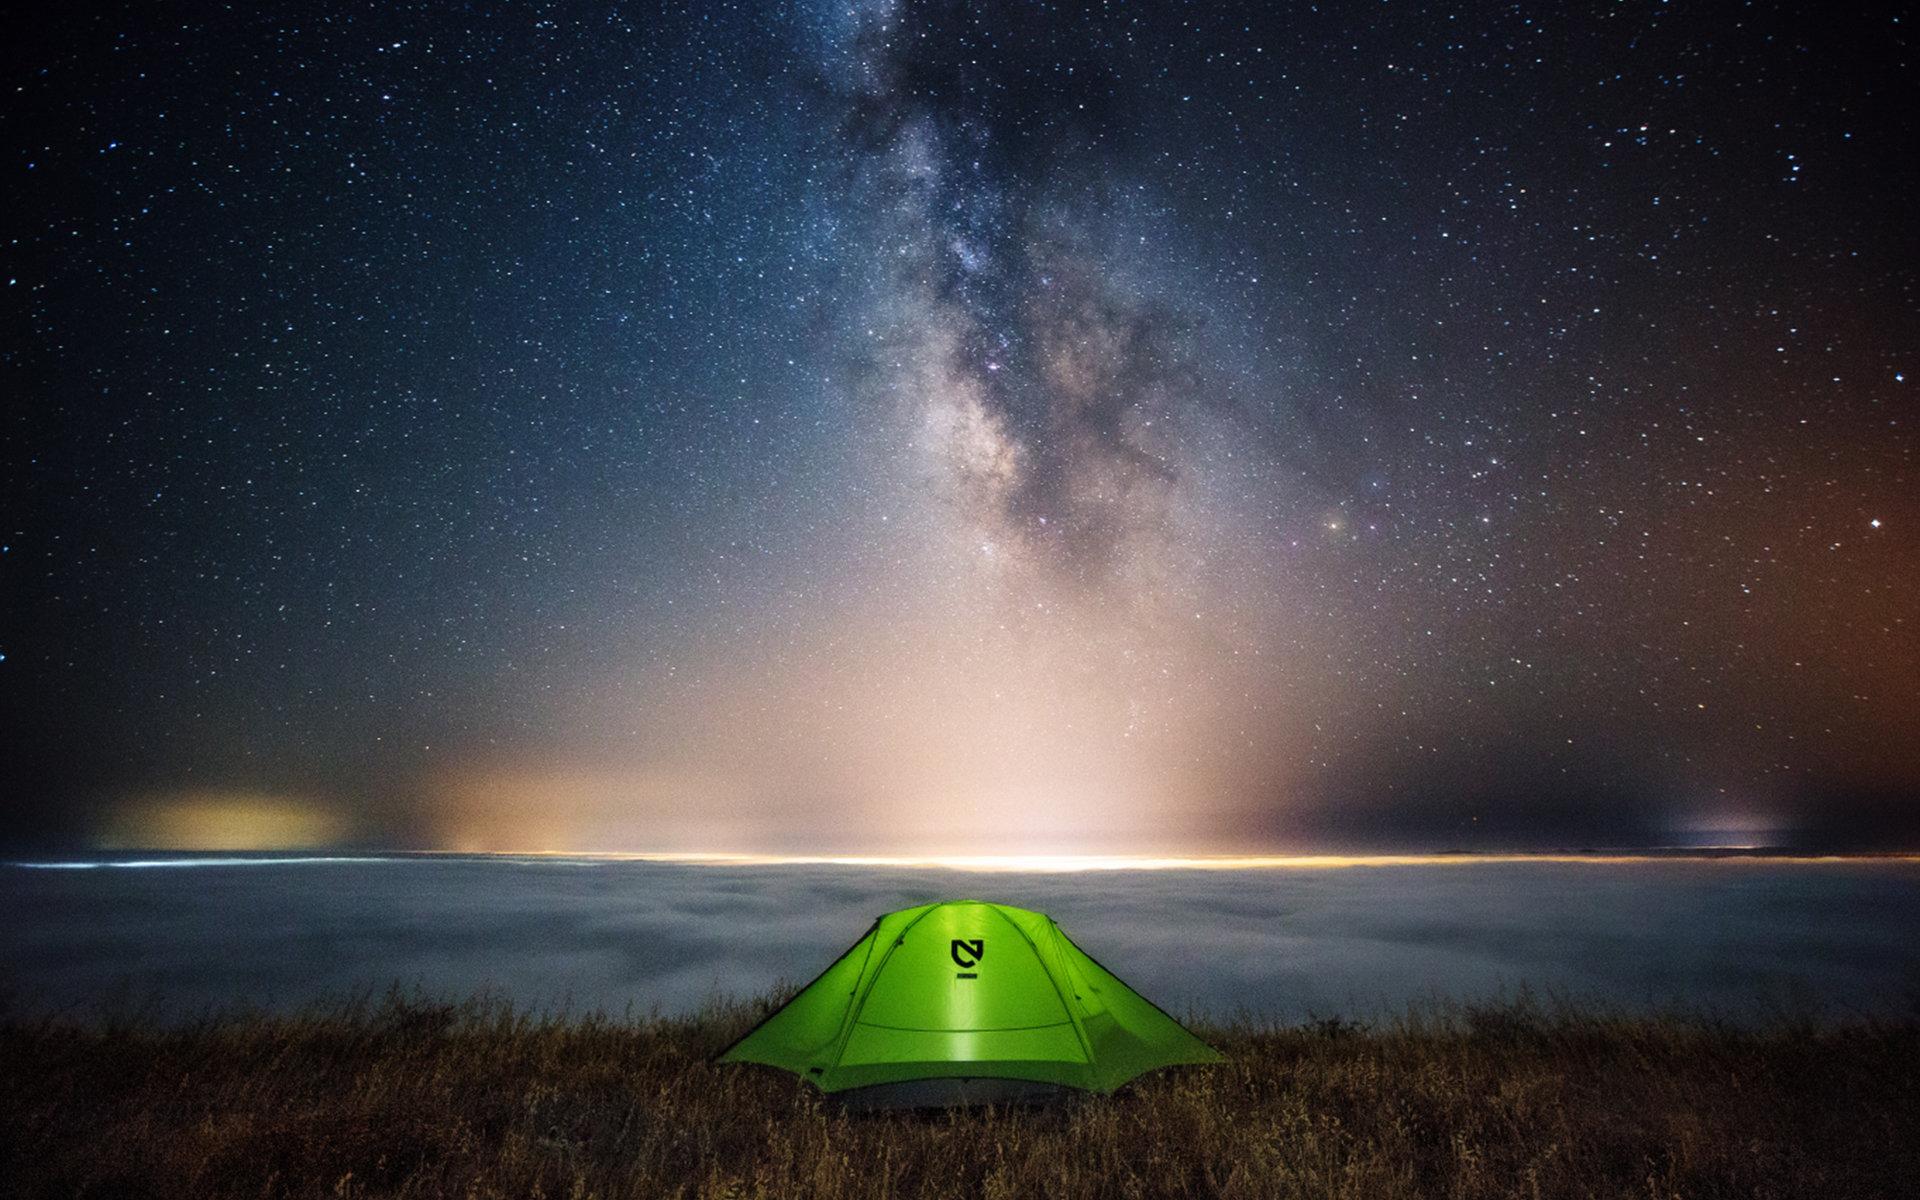 Free Camping Desktop Wallpaper